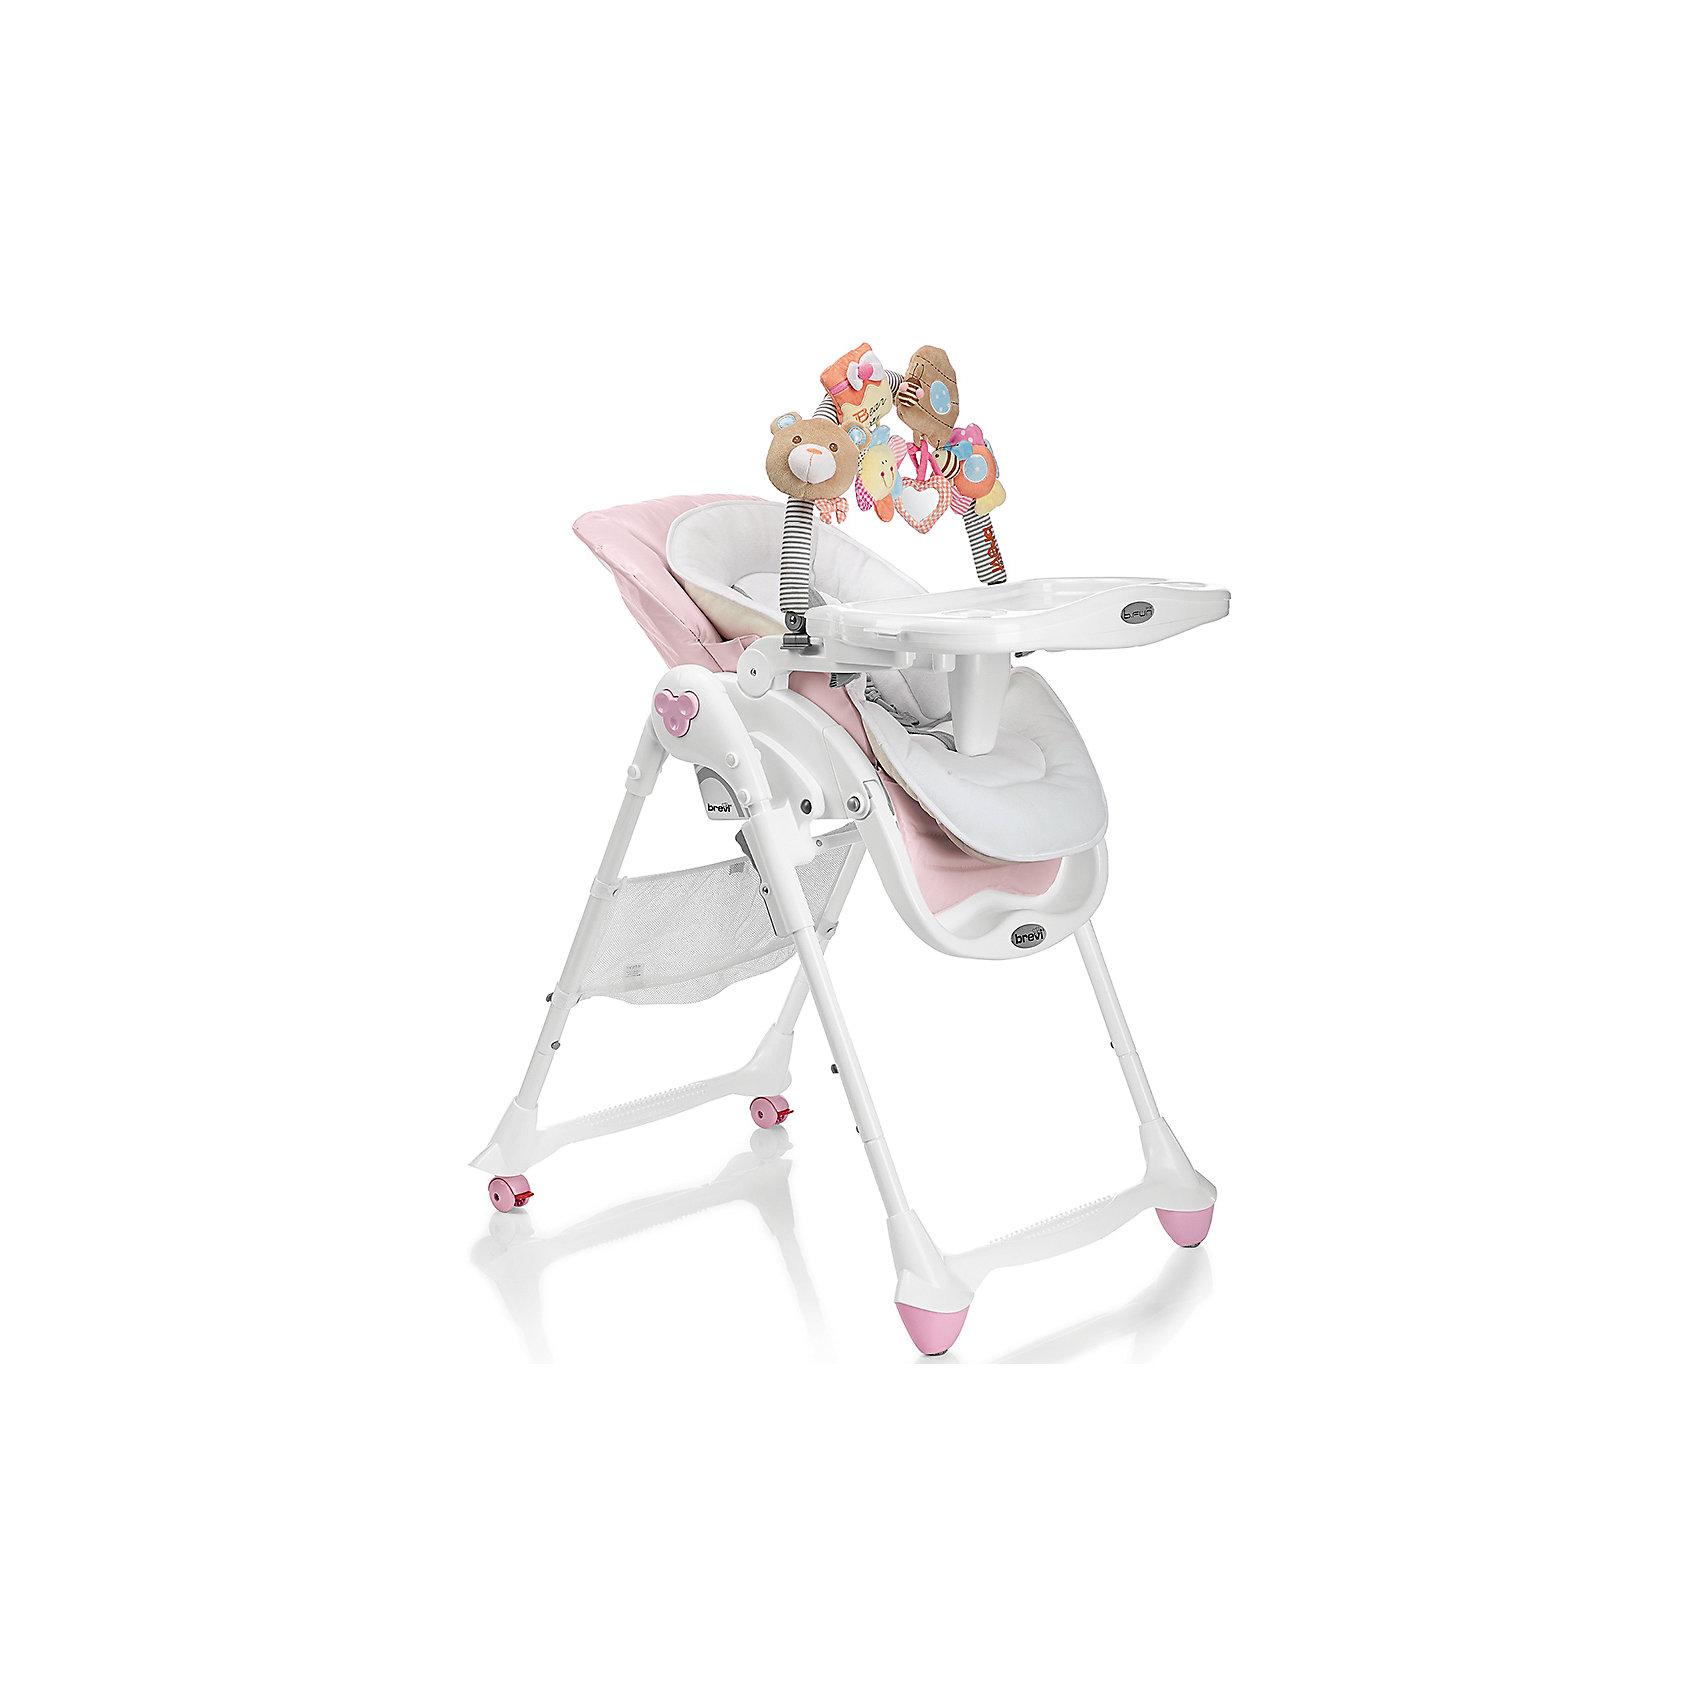 Стульчик для кормления B-Fun, Brevi, розовый